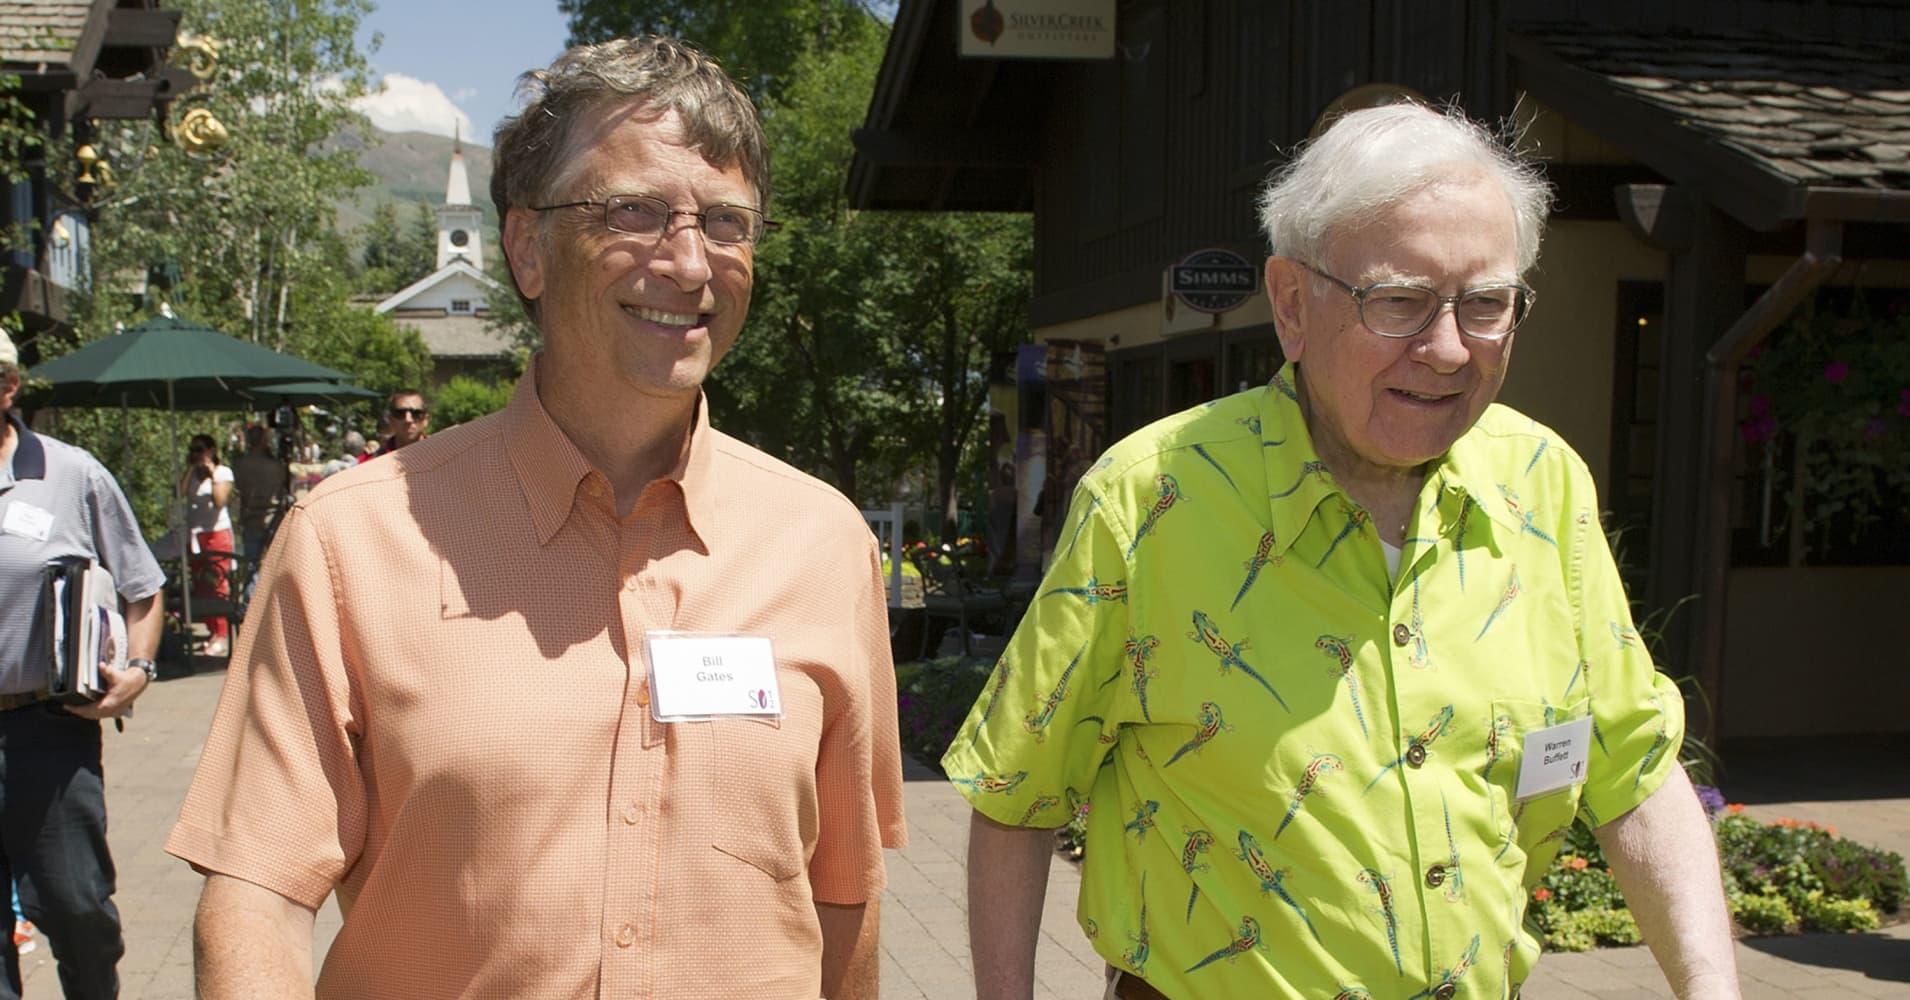 How Warren Buffett S Measure Of Success Shaped 2018 For Bill Gates